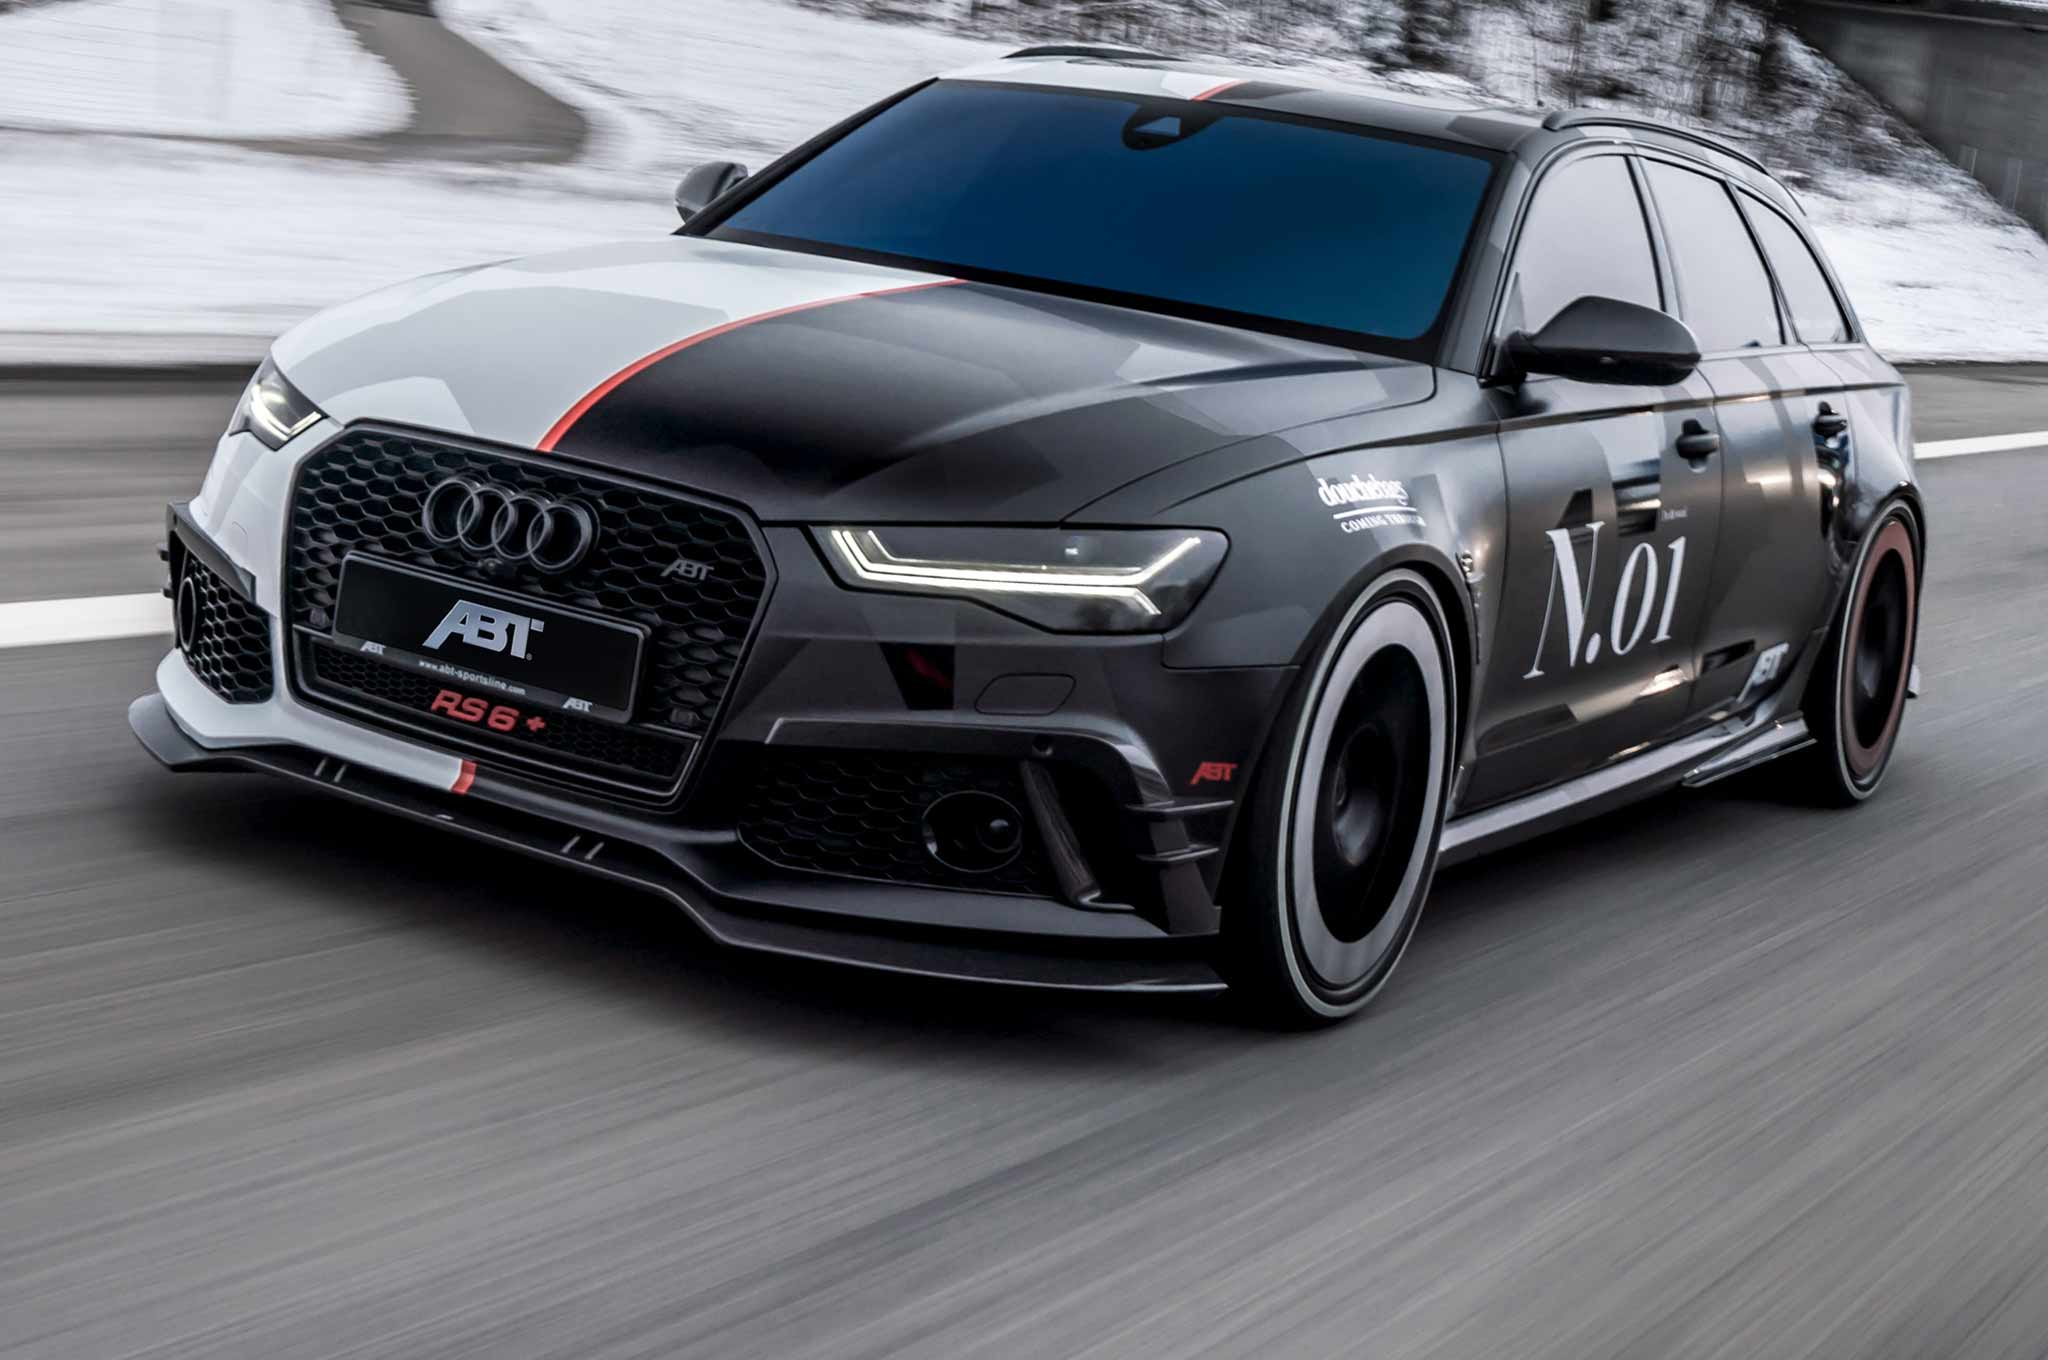 Jon Olsson S Audi Rs 6 Wagon Is Reborn As Project Phoenix